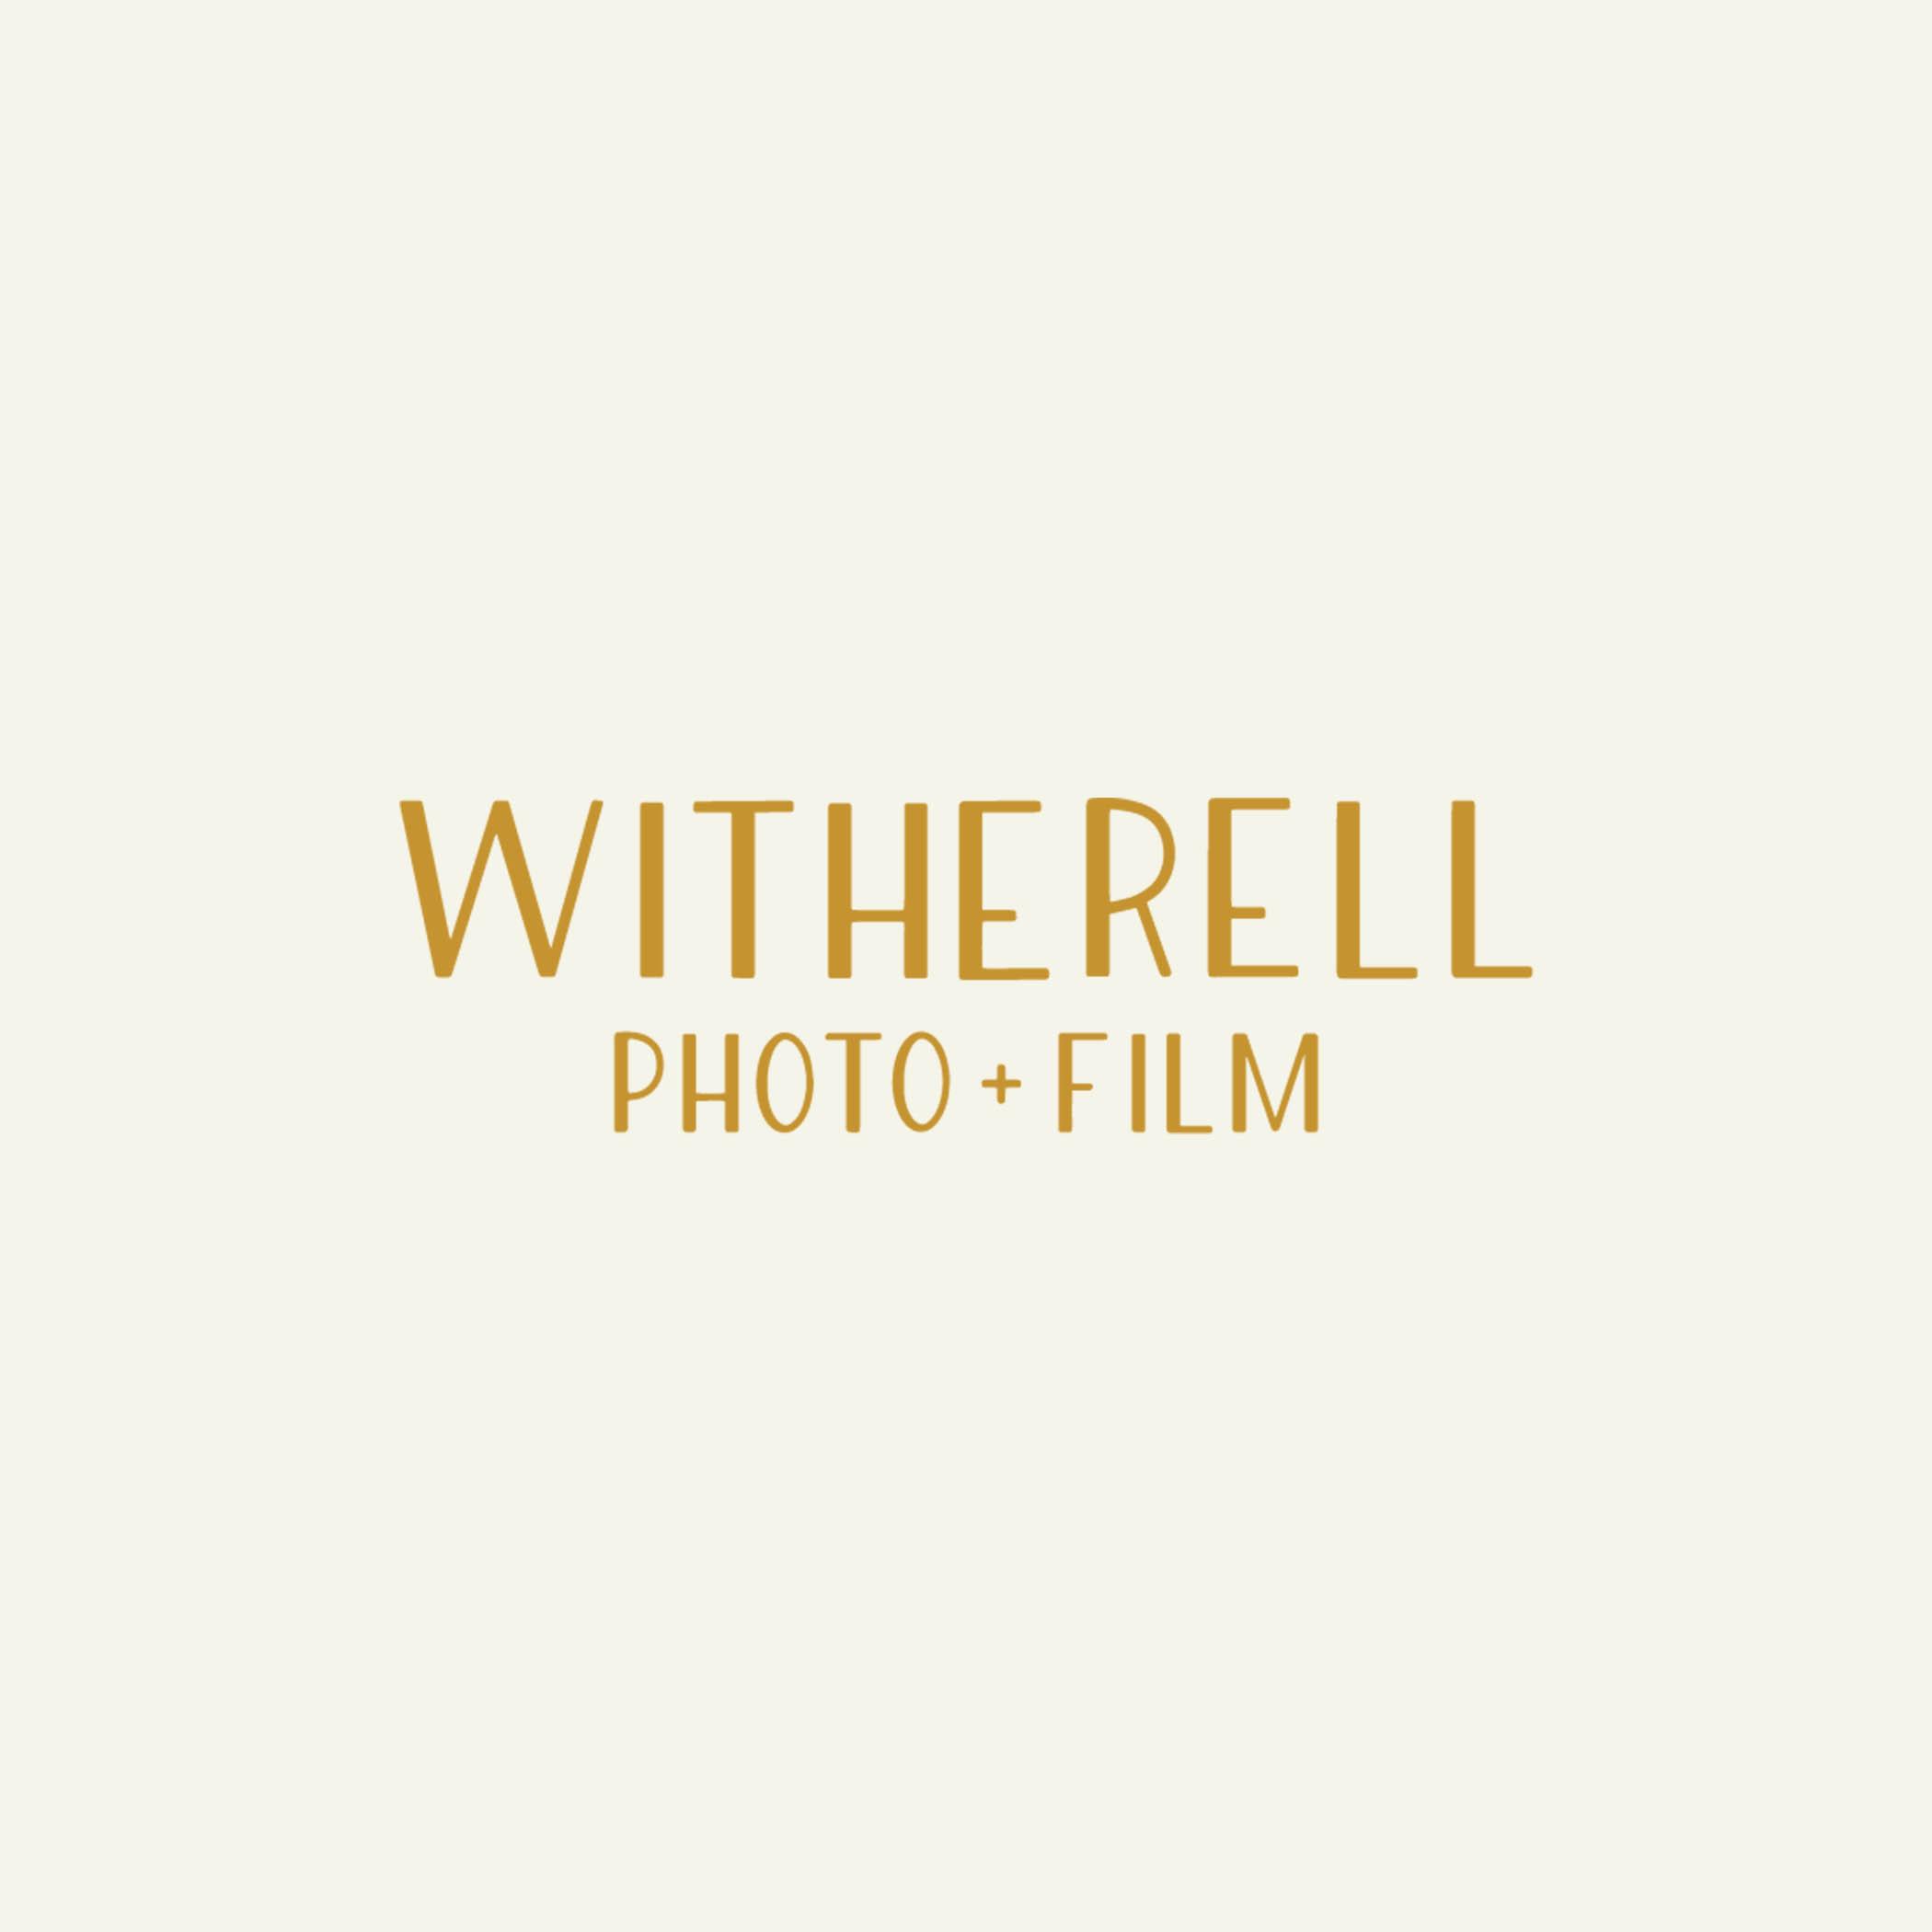 sans serif font for photographer logo